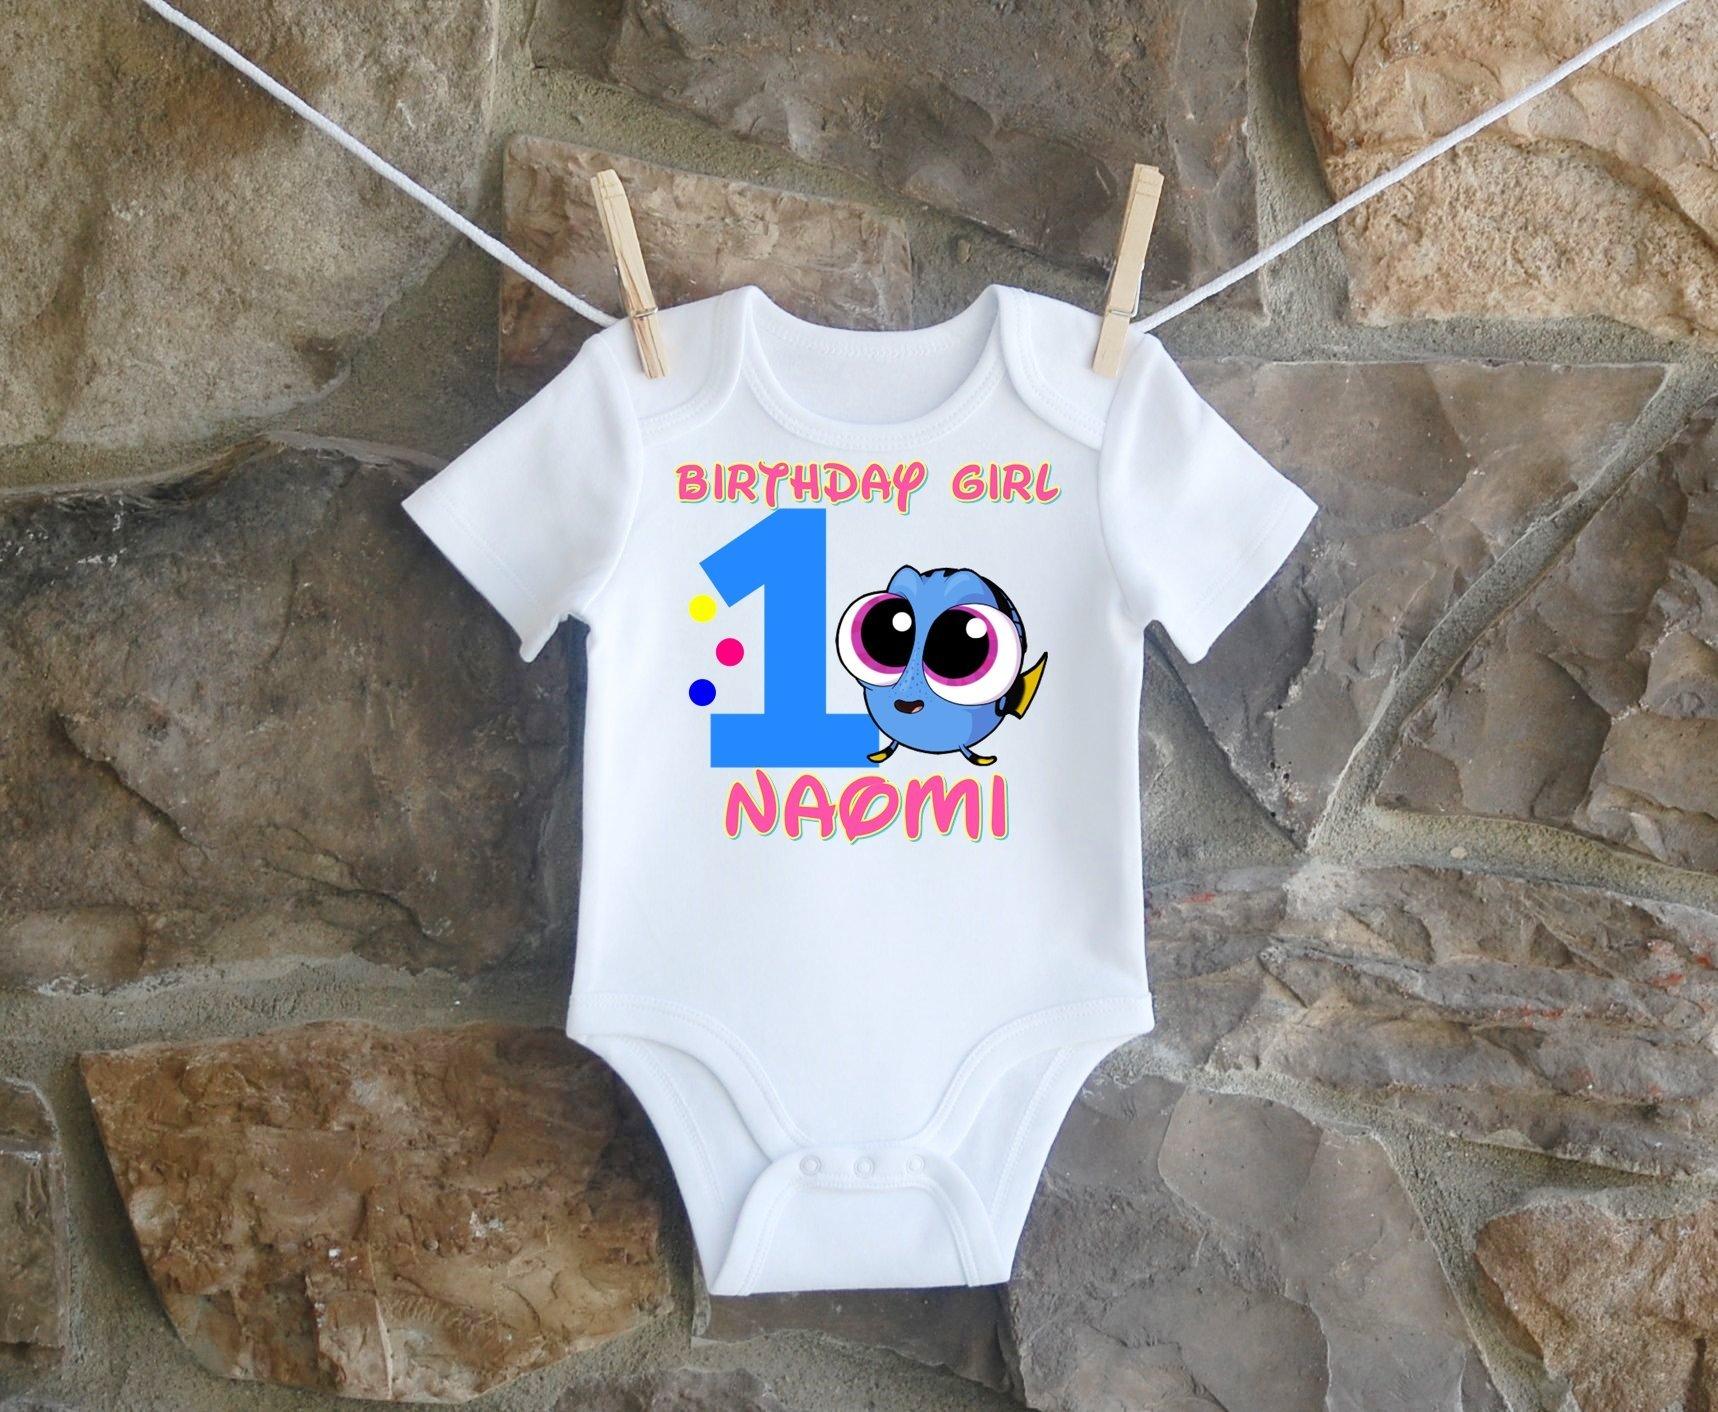 Finding Dory Birthday Shirt, Finding Dory Birthday Shirt For Girls, Personalized Girls Dory Birthday Shirt, Customized Finding Dory Birthday Shirt